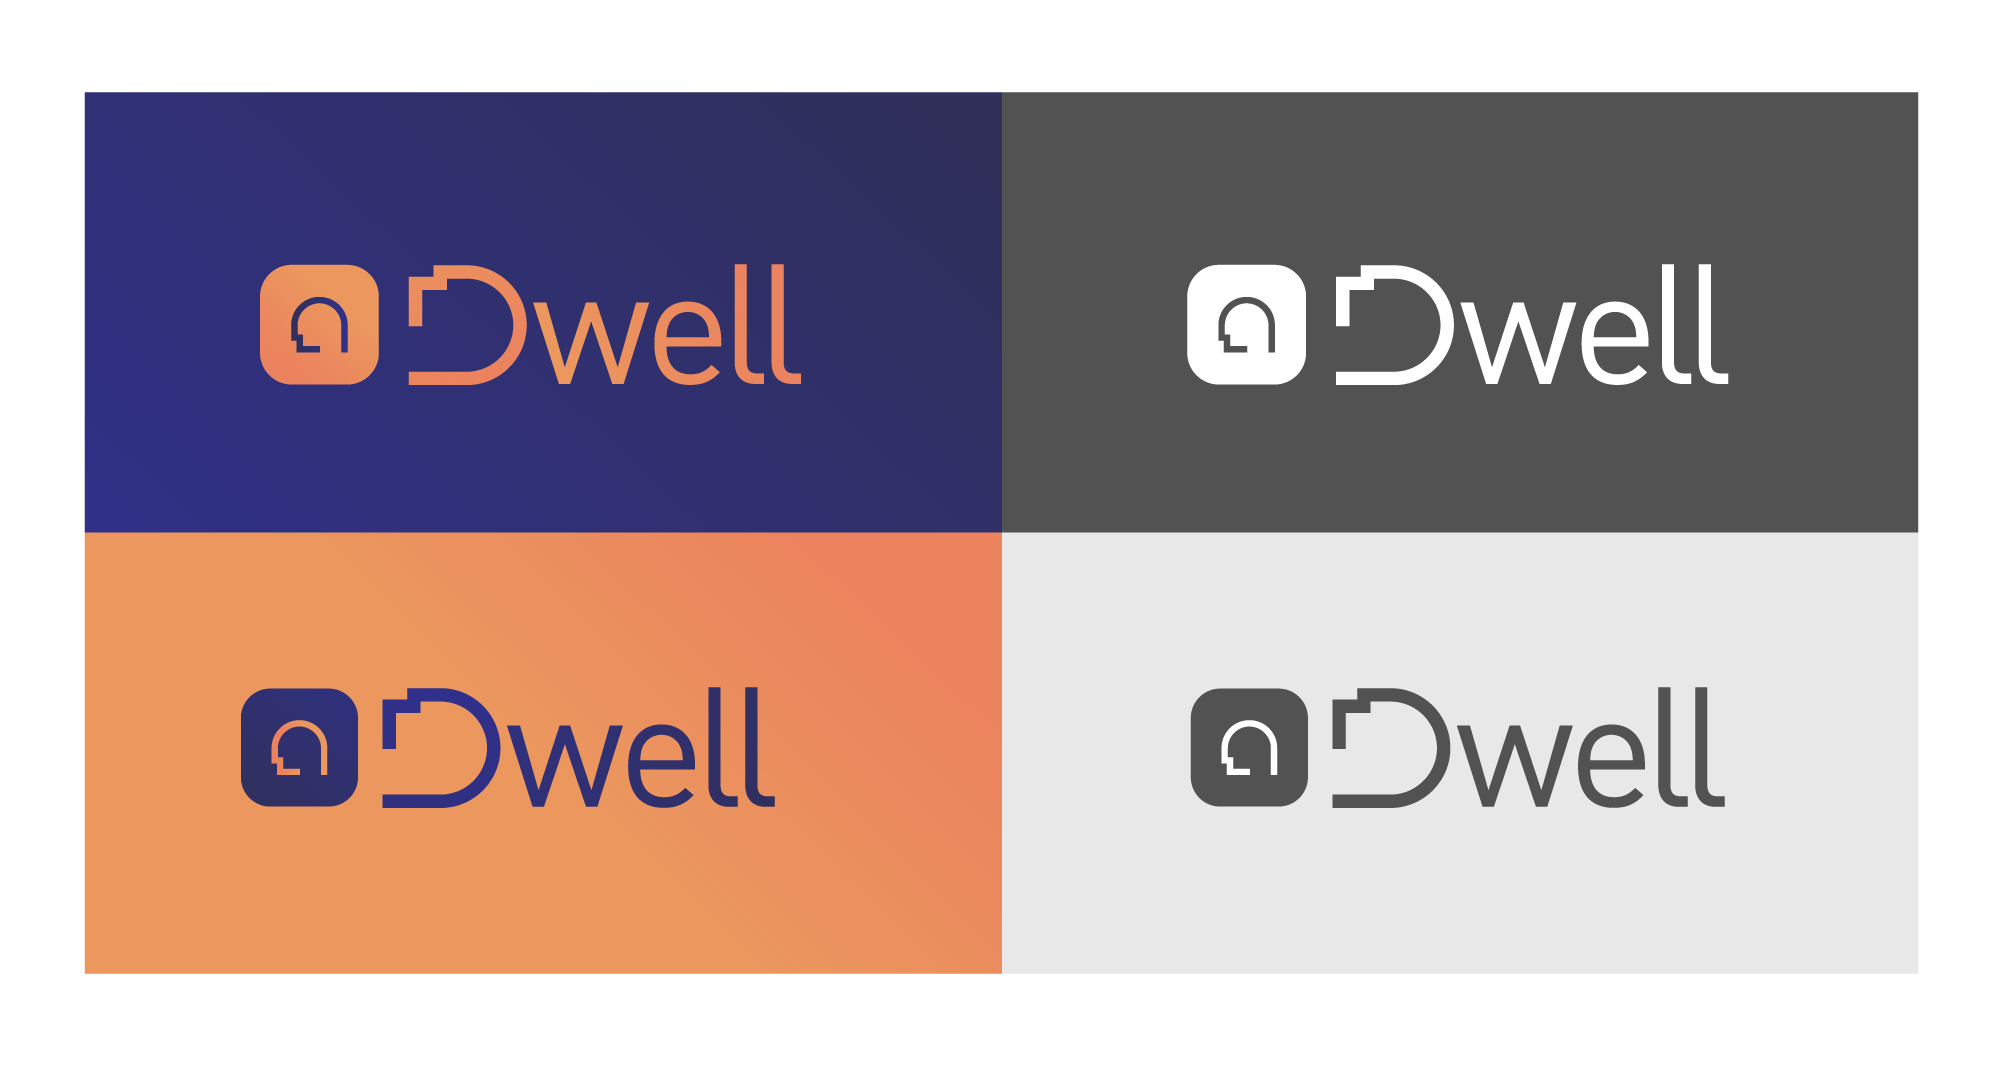 dwell_logo_variations